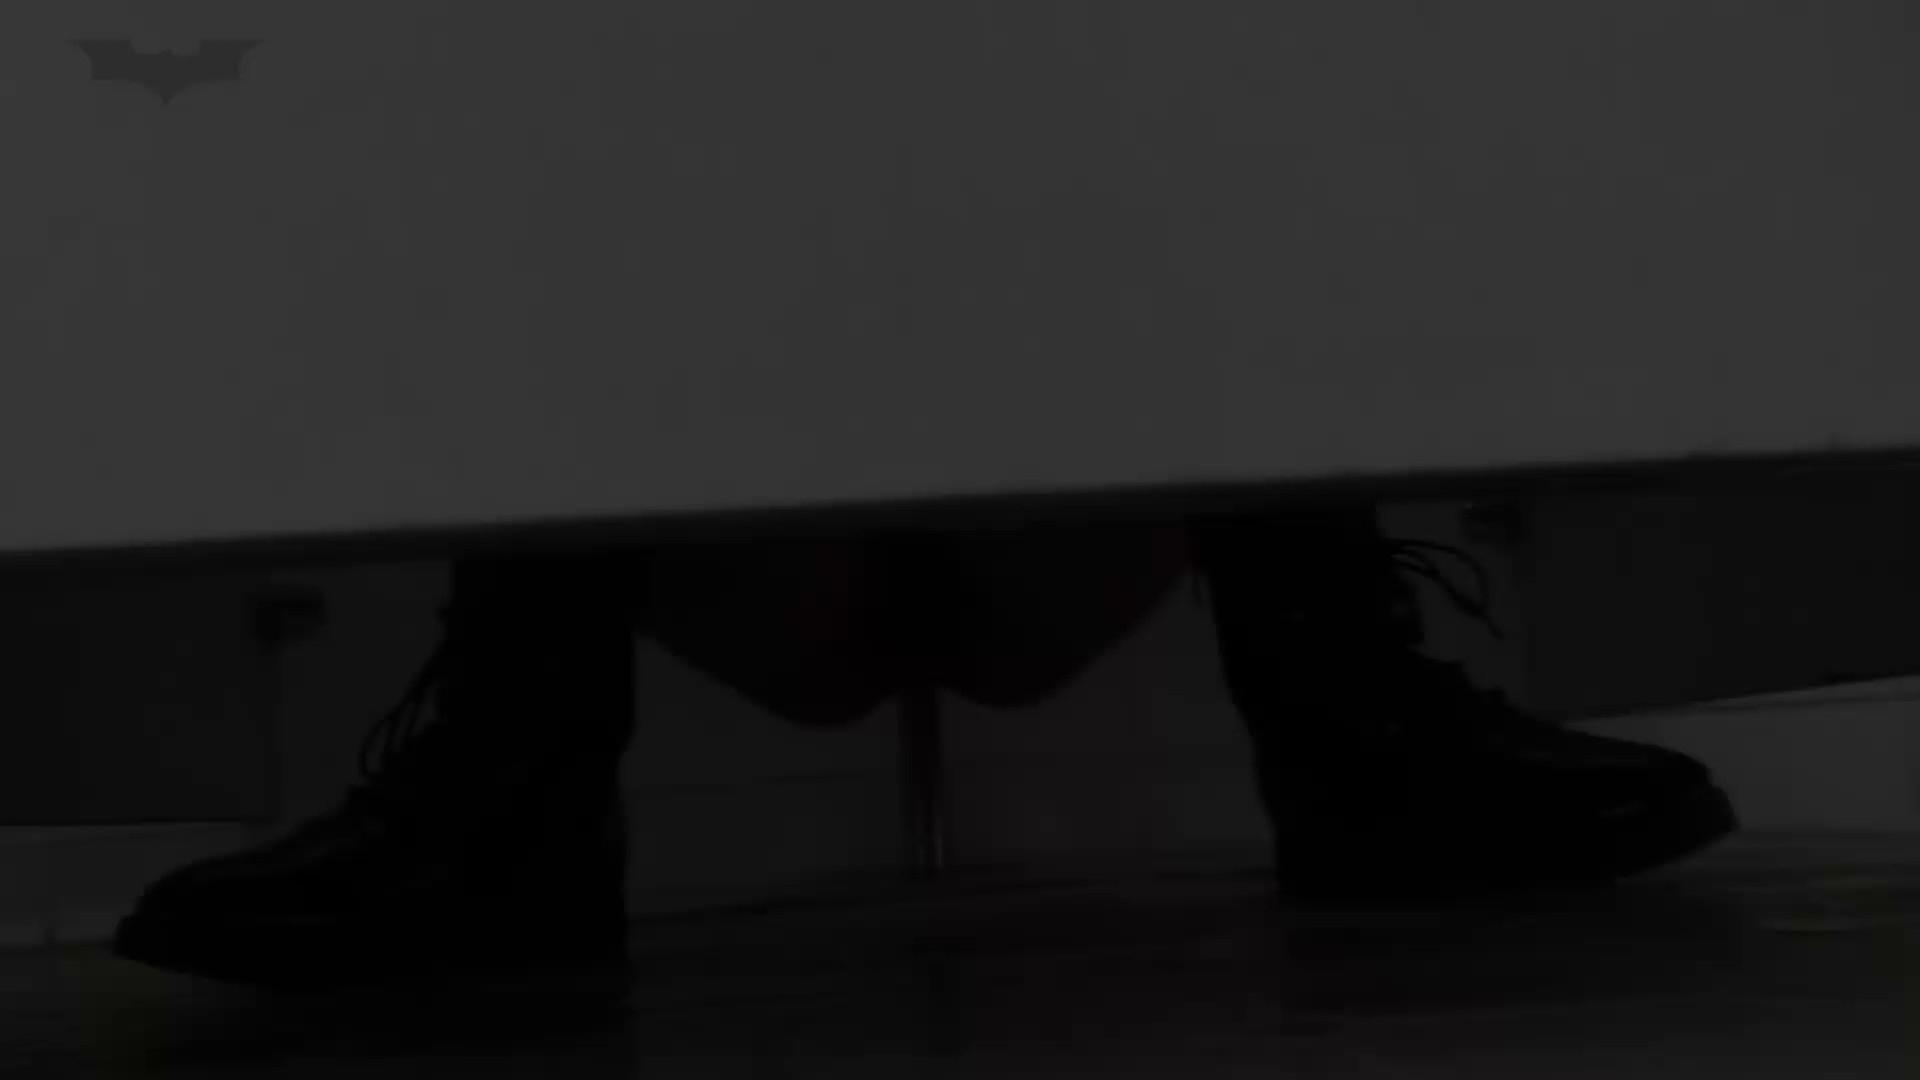 JD盗撮 美女の洗面所の秘密 Vol.38 女性トイレ 盗撮画像 110pic 71